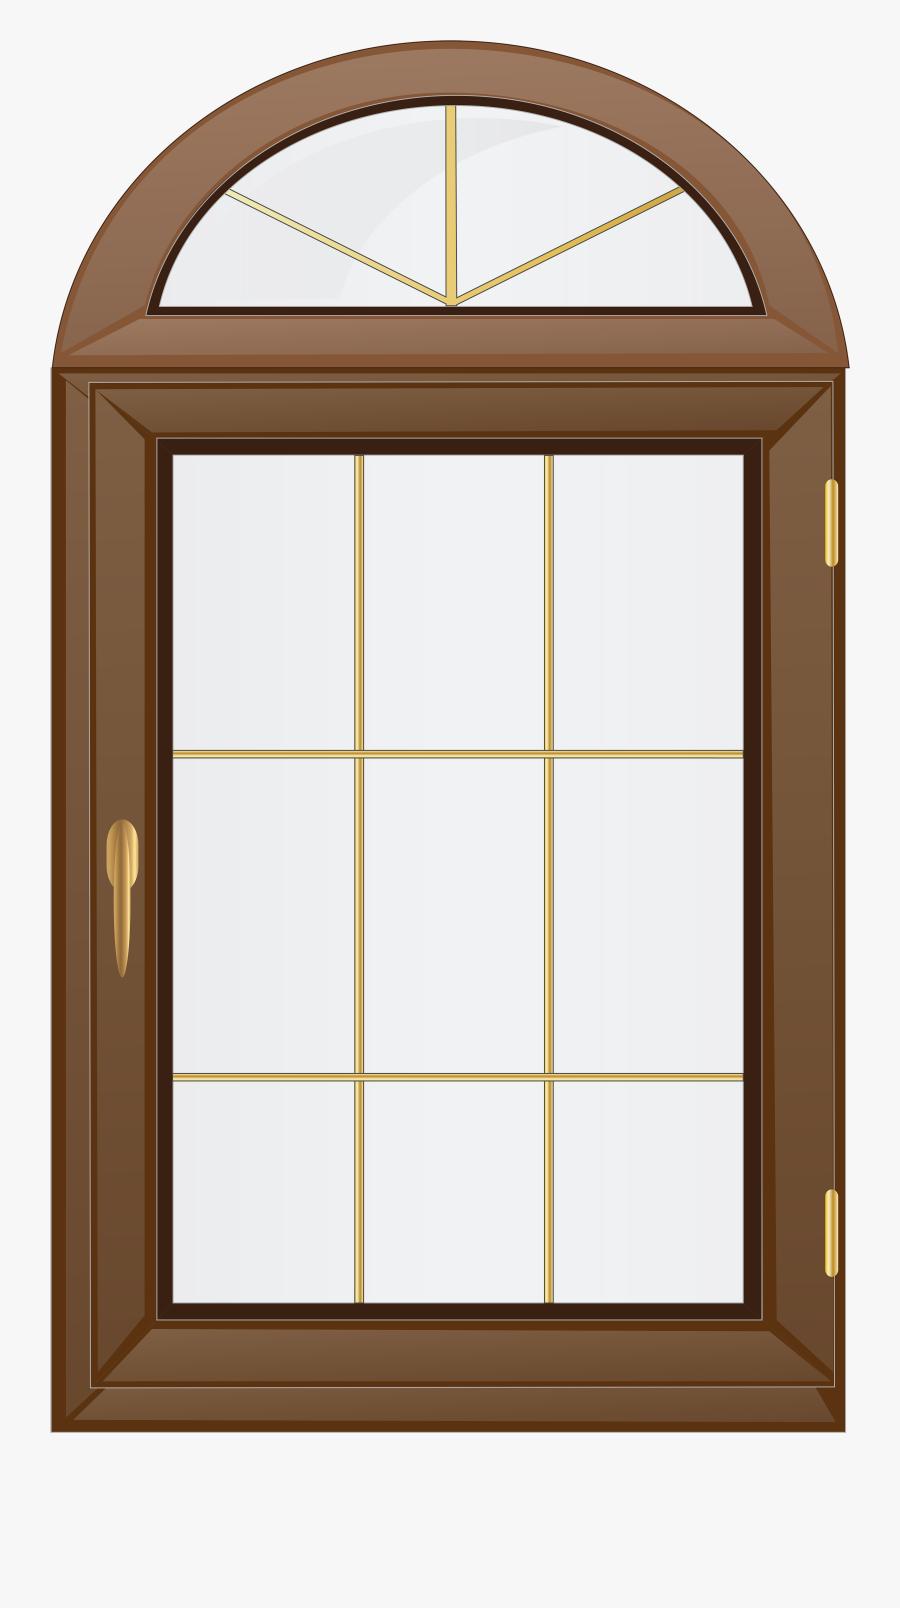 Transparent Brown Window Png Clip Art - Window Clipart Png, Transparent Clipart